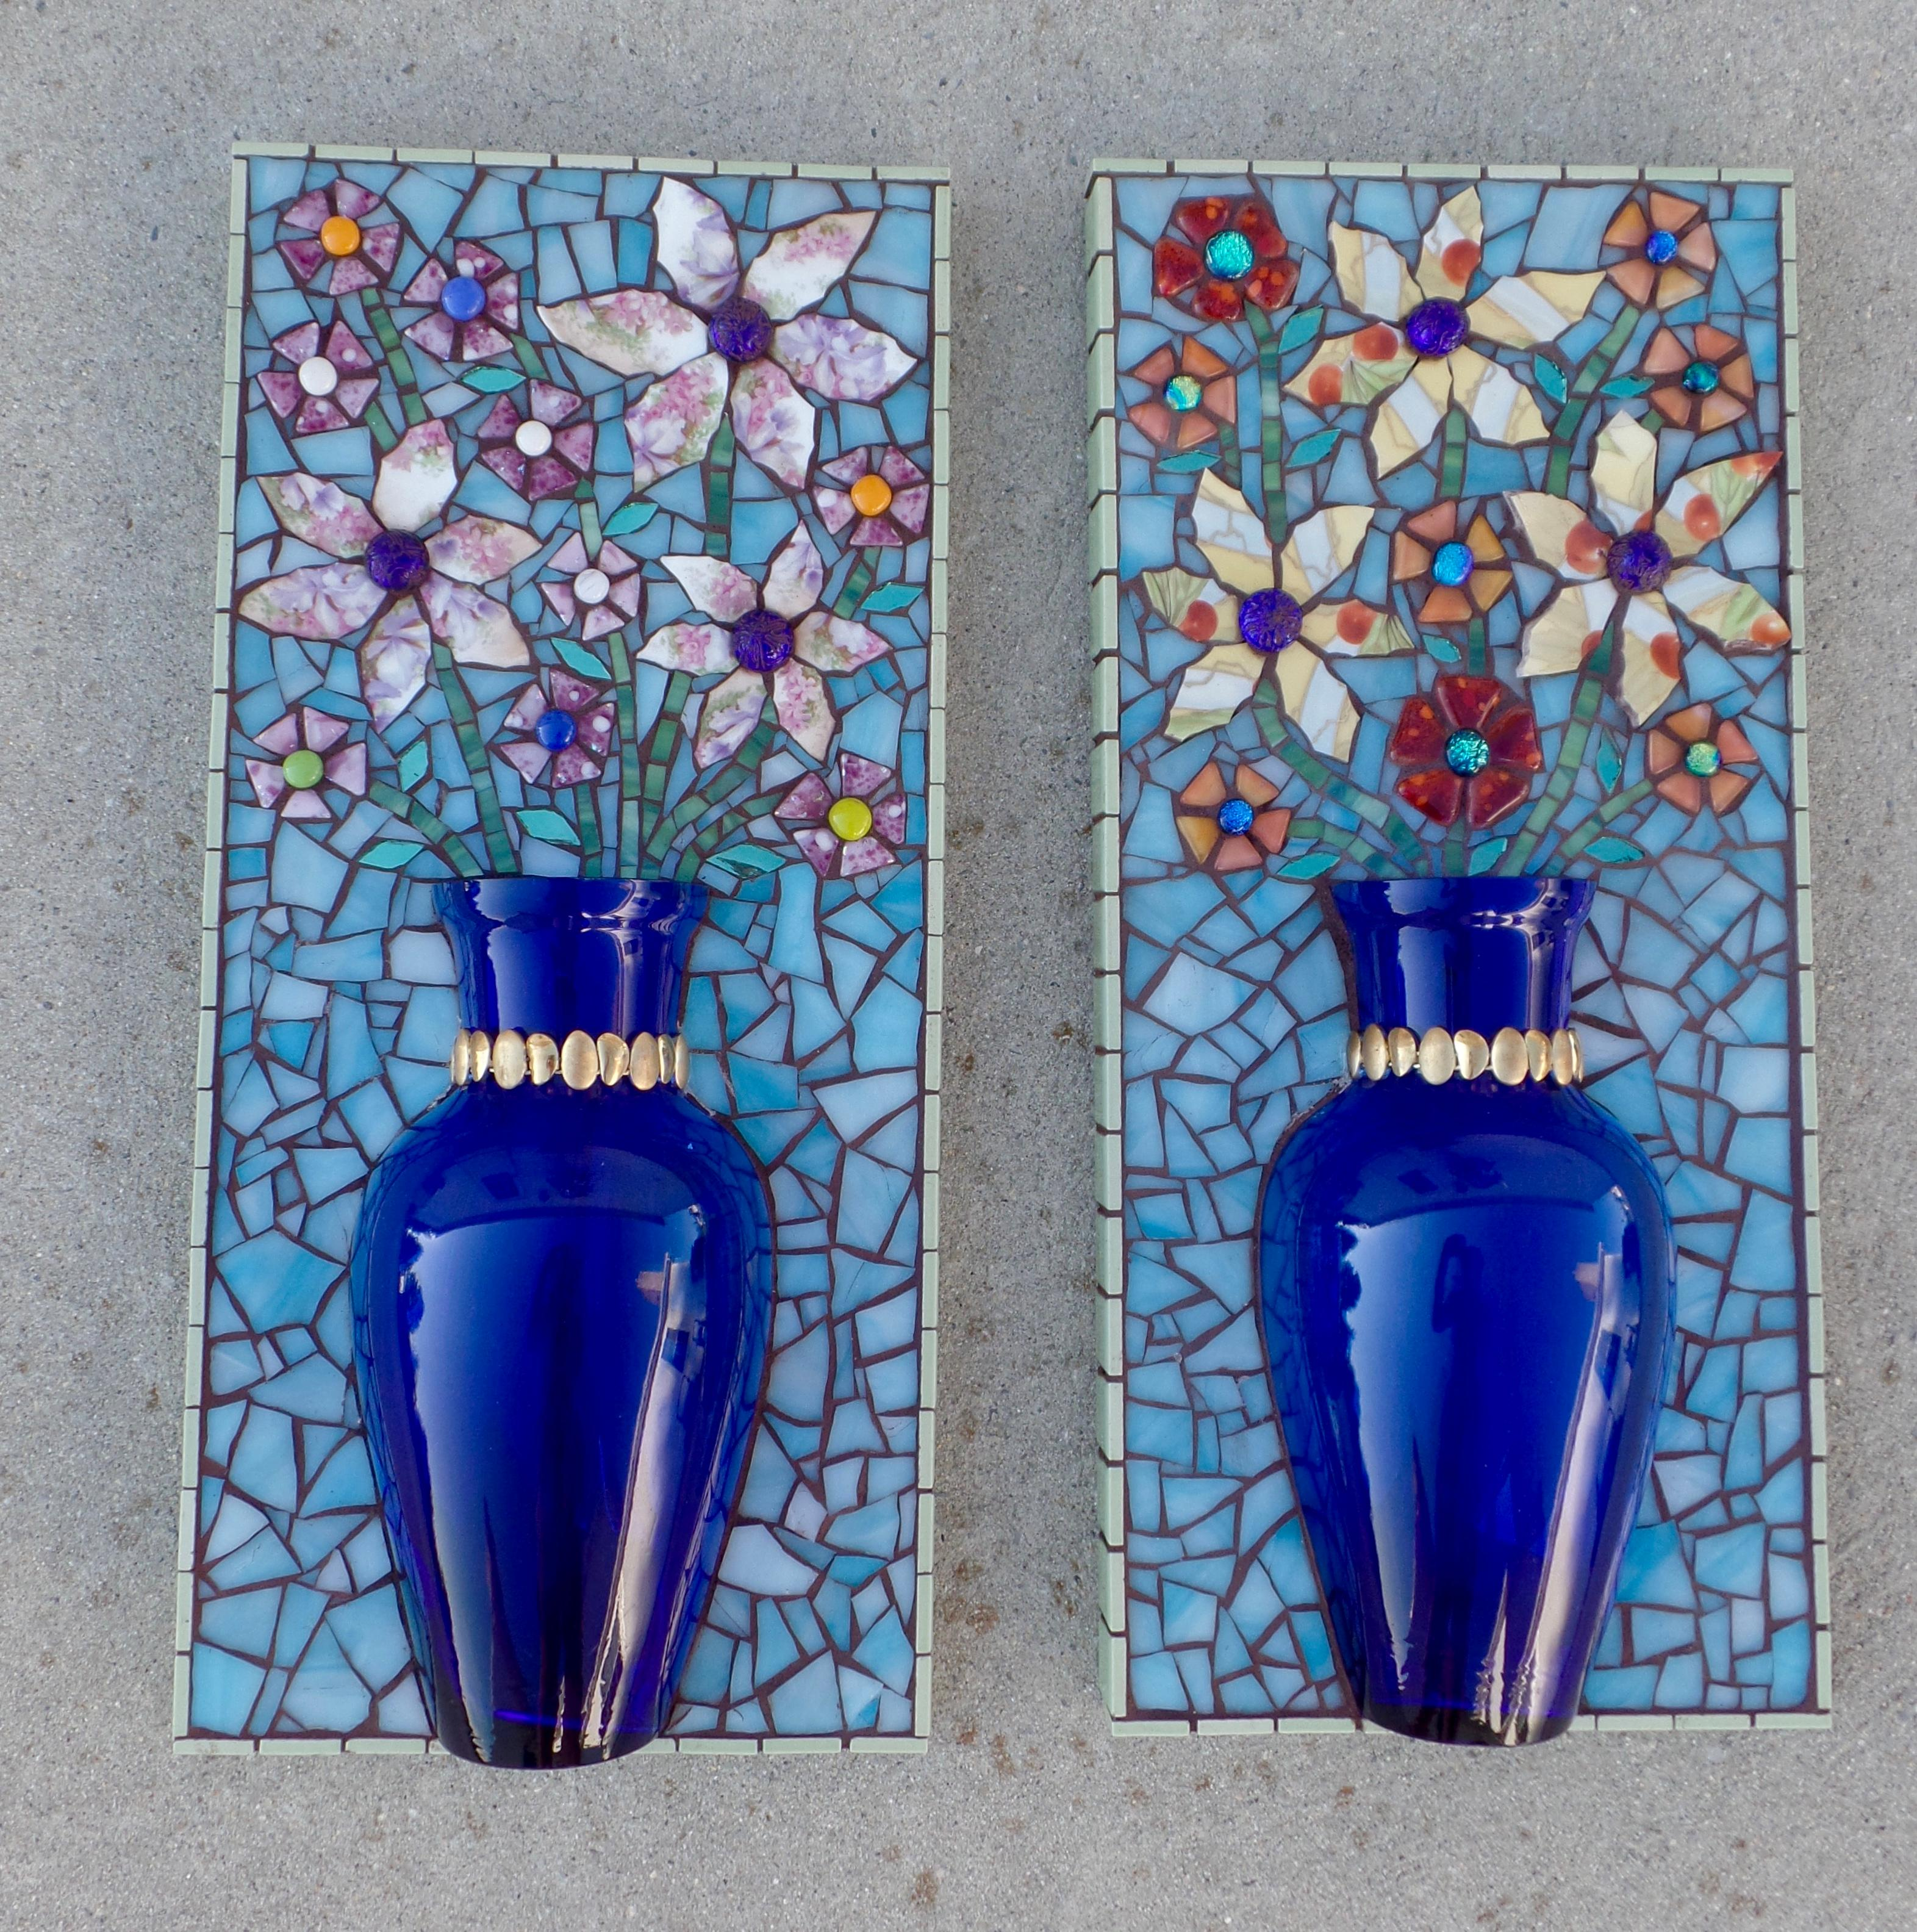 Cobalt Blue Vases Delphi Artist Gallery